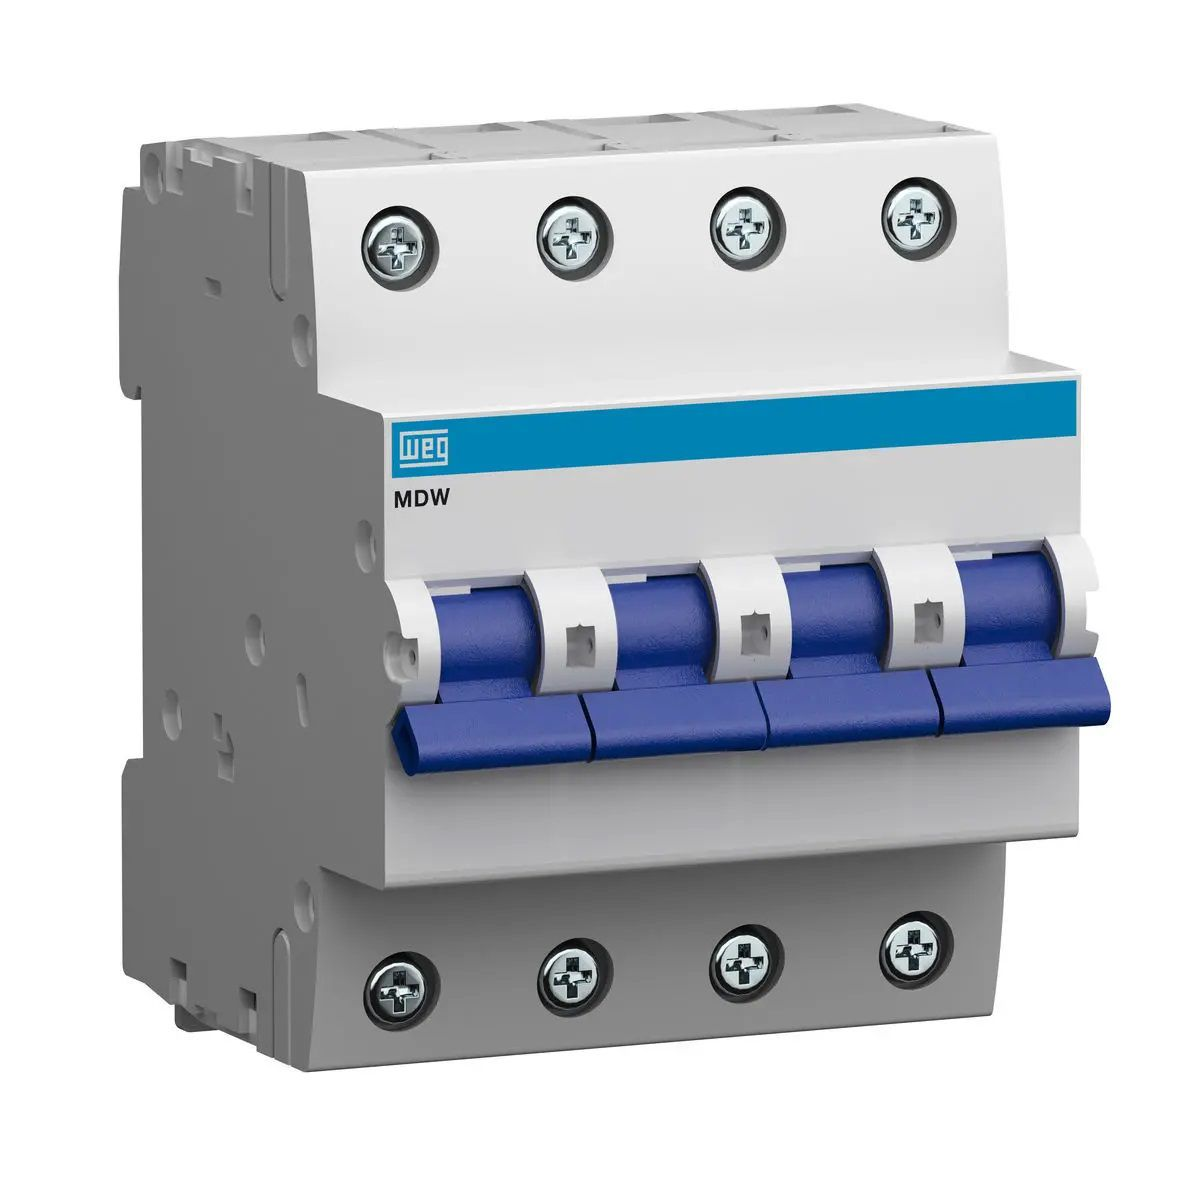 Minidisjuntor Termomagnético WEG MDW-C125-4 (entrega em 5 dias)